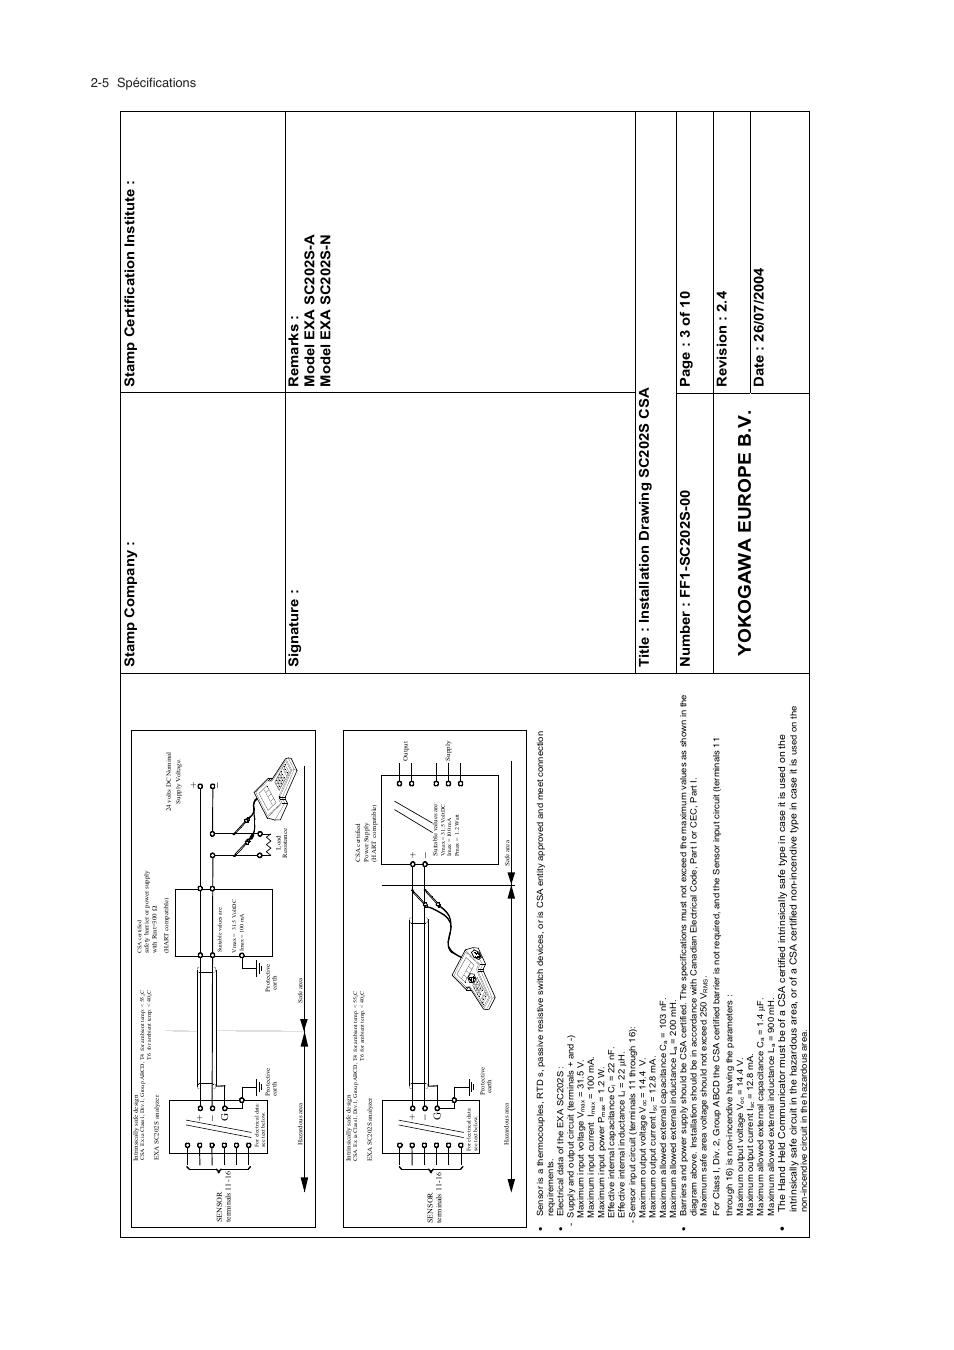 medium resolution of  battery yokogawa europe b v 5 sp cifications yokogawa exa sc202 2 wire on lighting diagrams